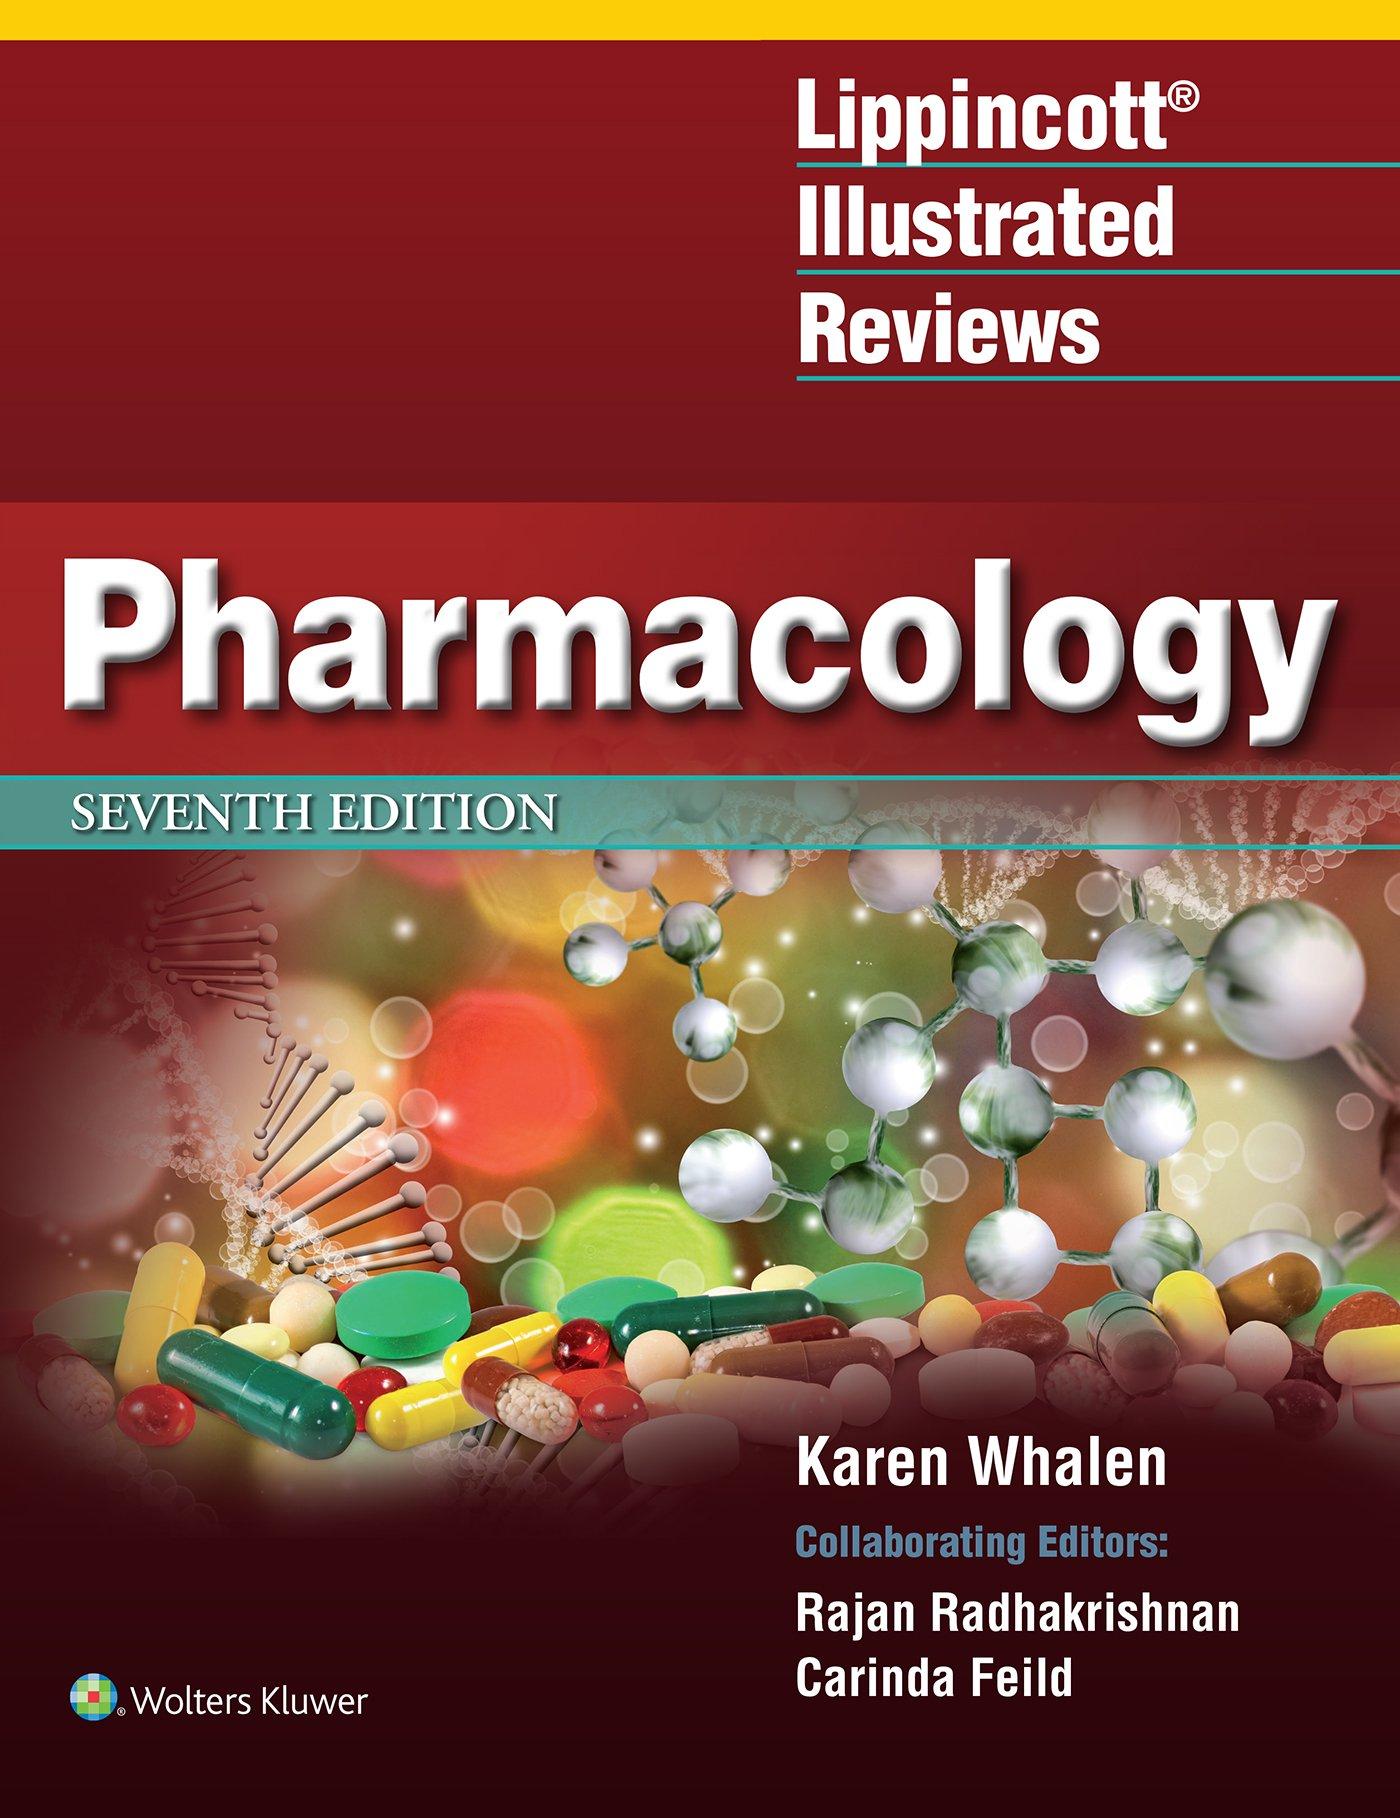 Lippincott Illustrated Reviews: Pharmacology (Lippincott Illustrated Reviews Series) by LWW